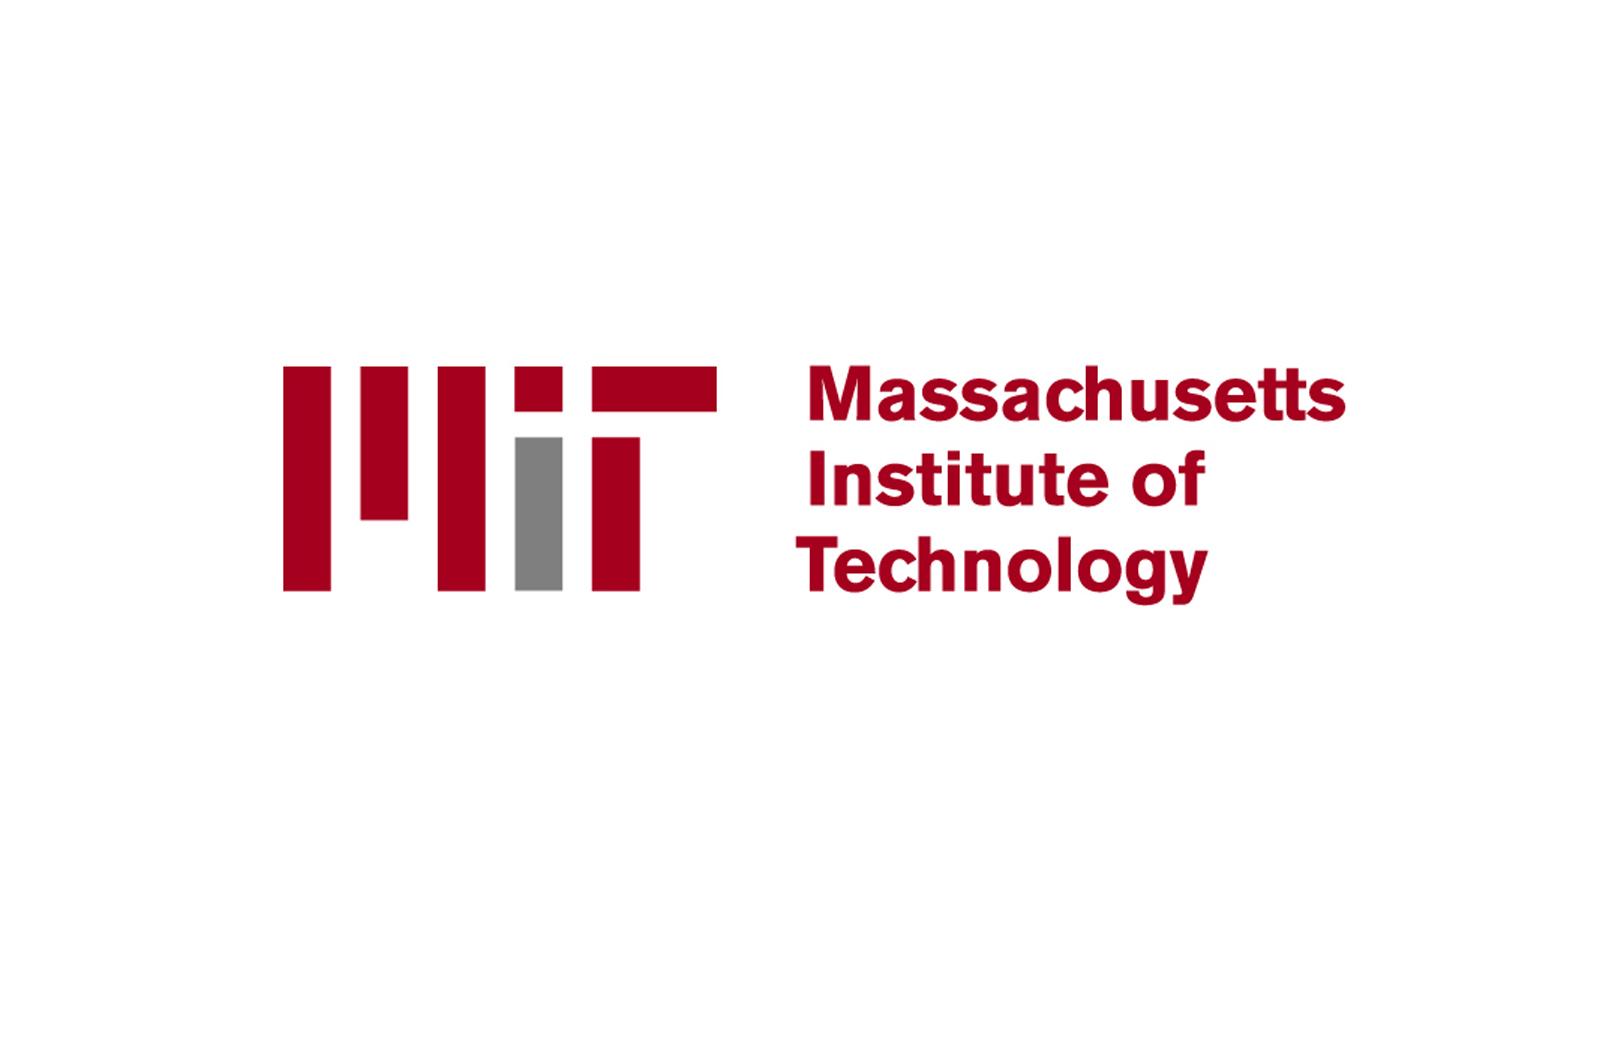 s. sensiper thesis massachusetts institute of technology